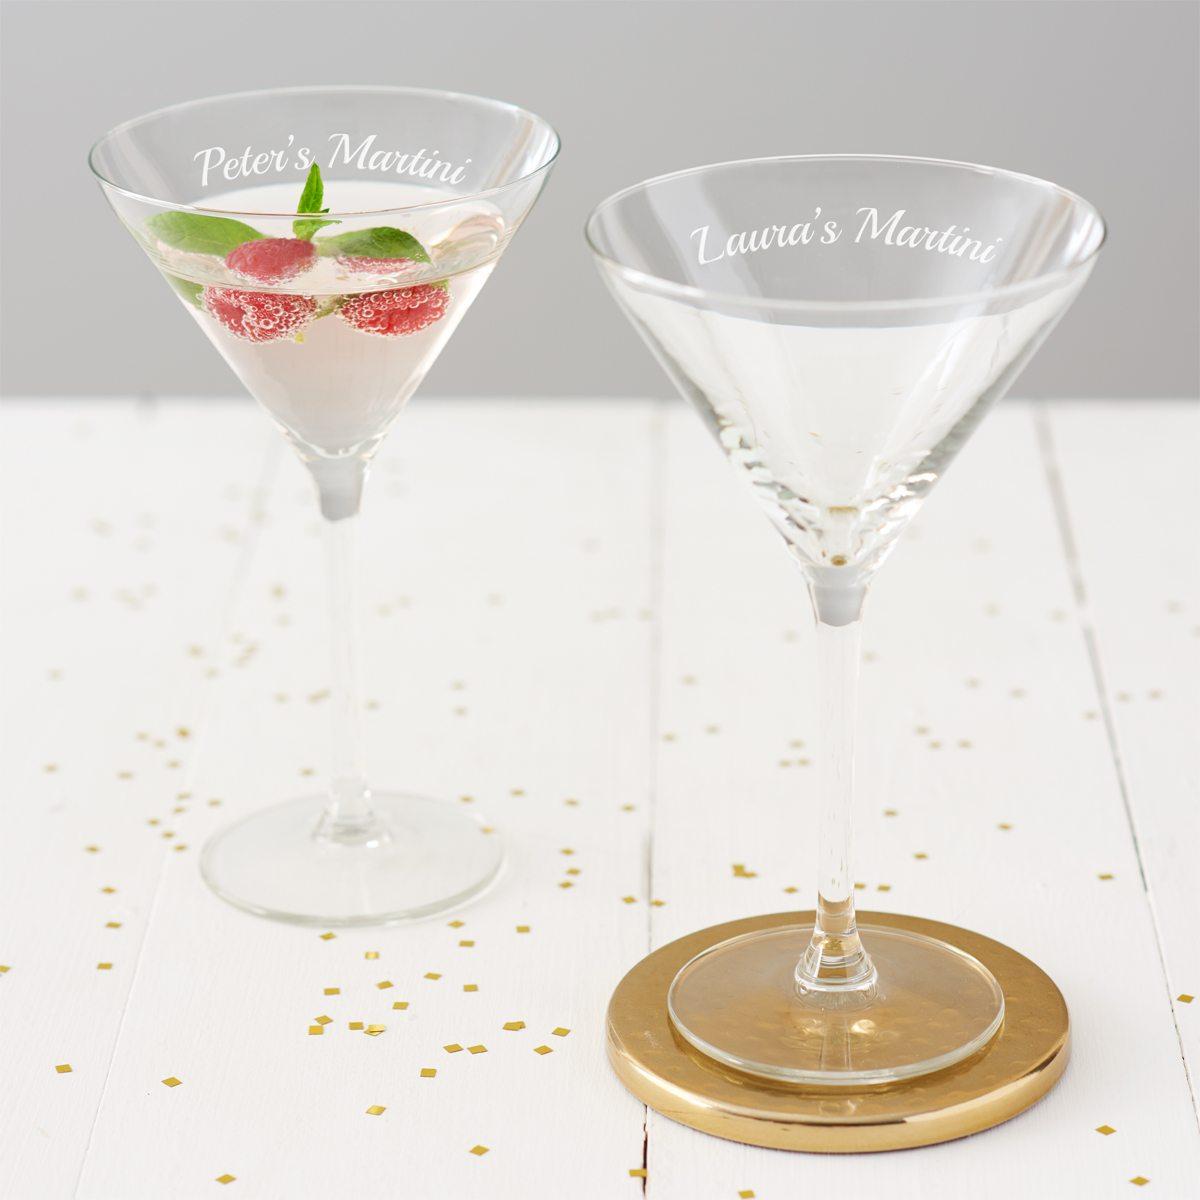 Personalised Martini Glass